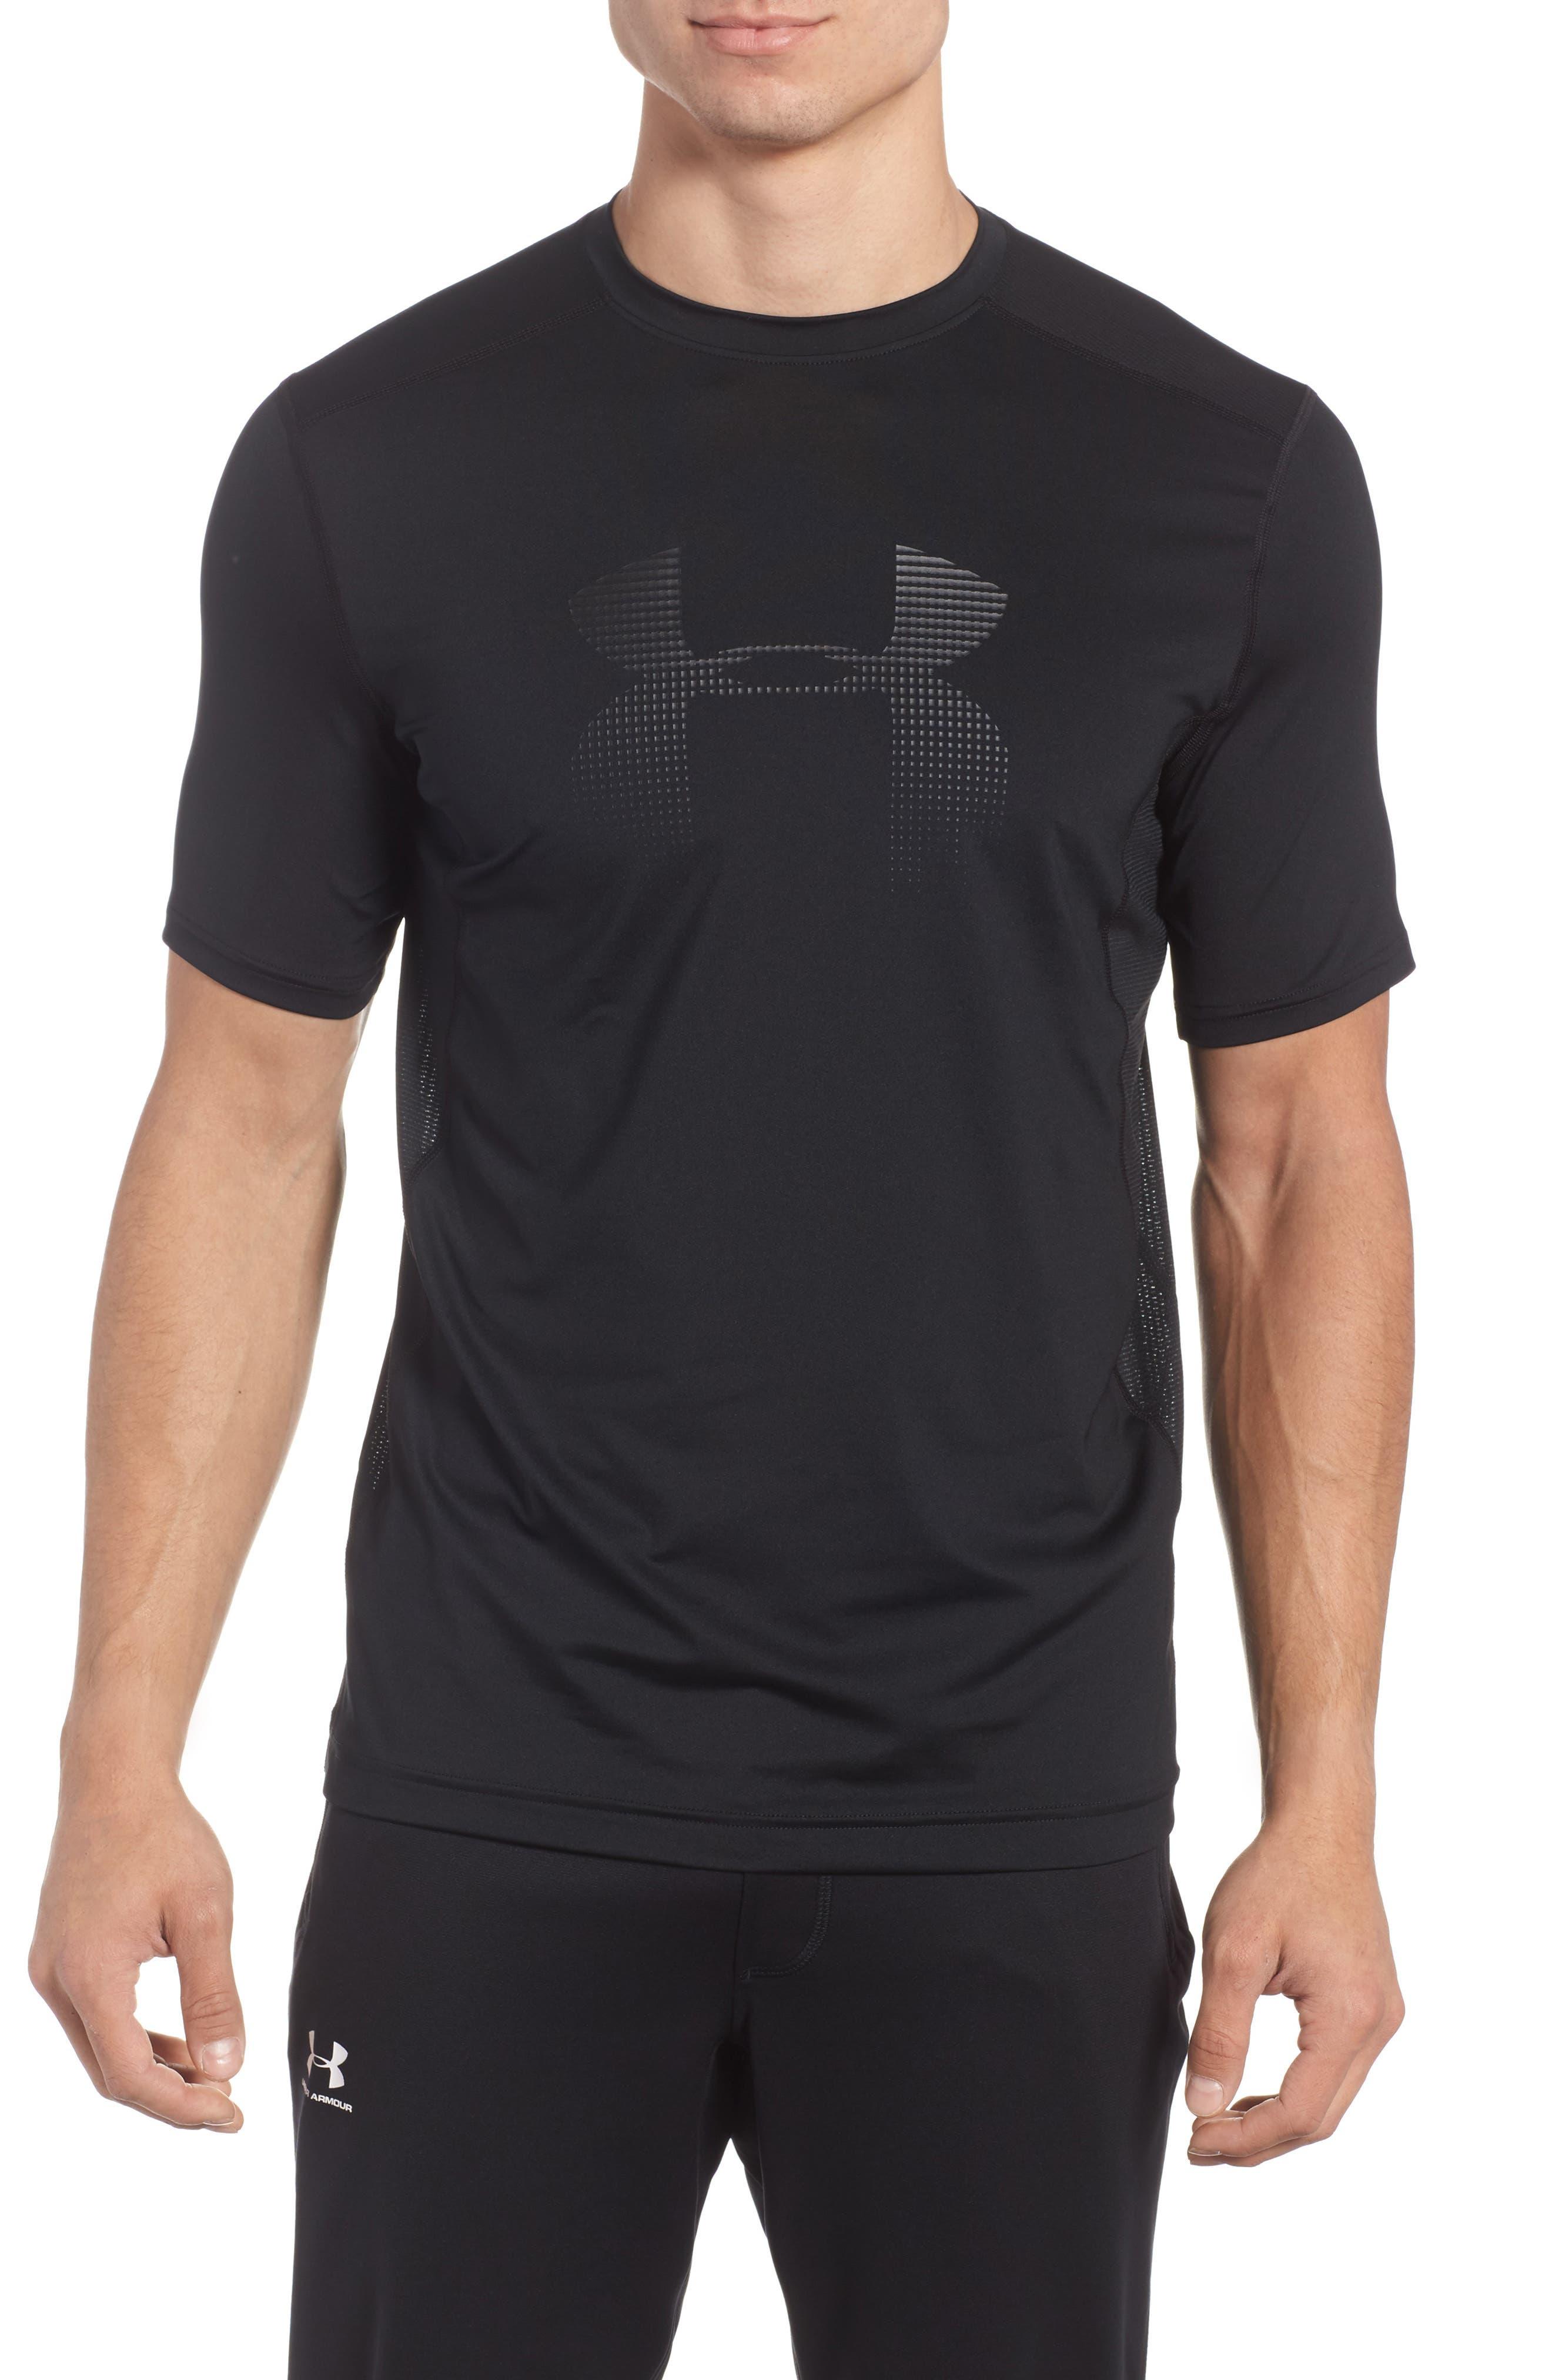 Raid Graphic T-Shirt,                             Main thumbnail 1, color,                             001